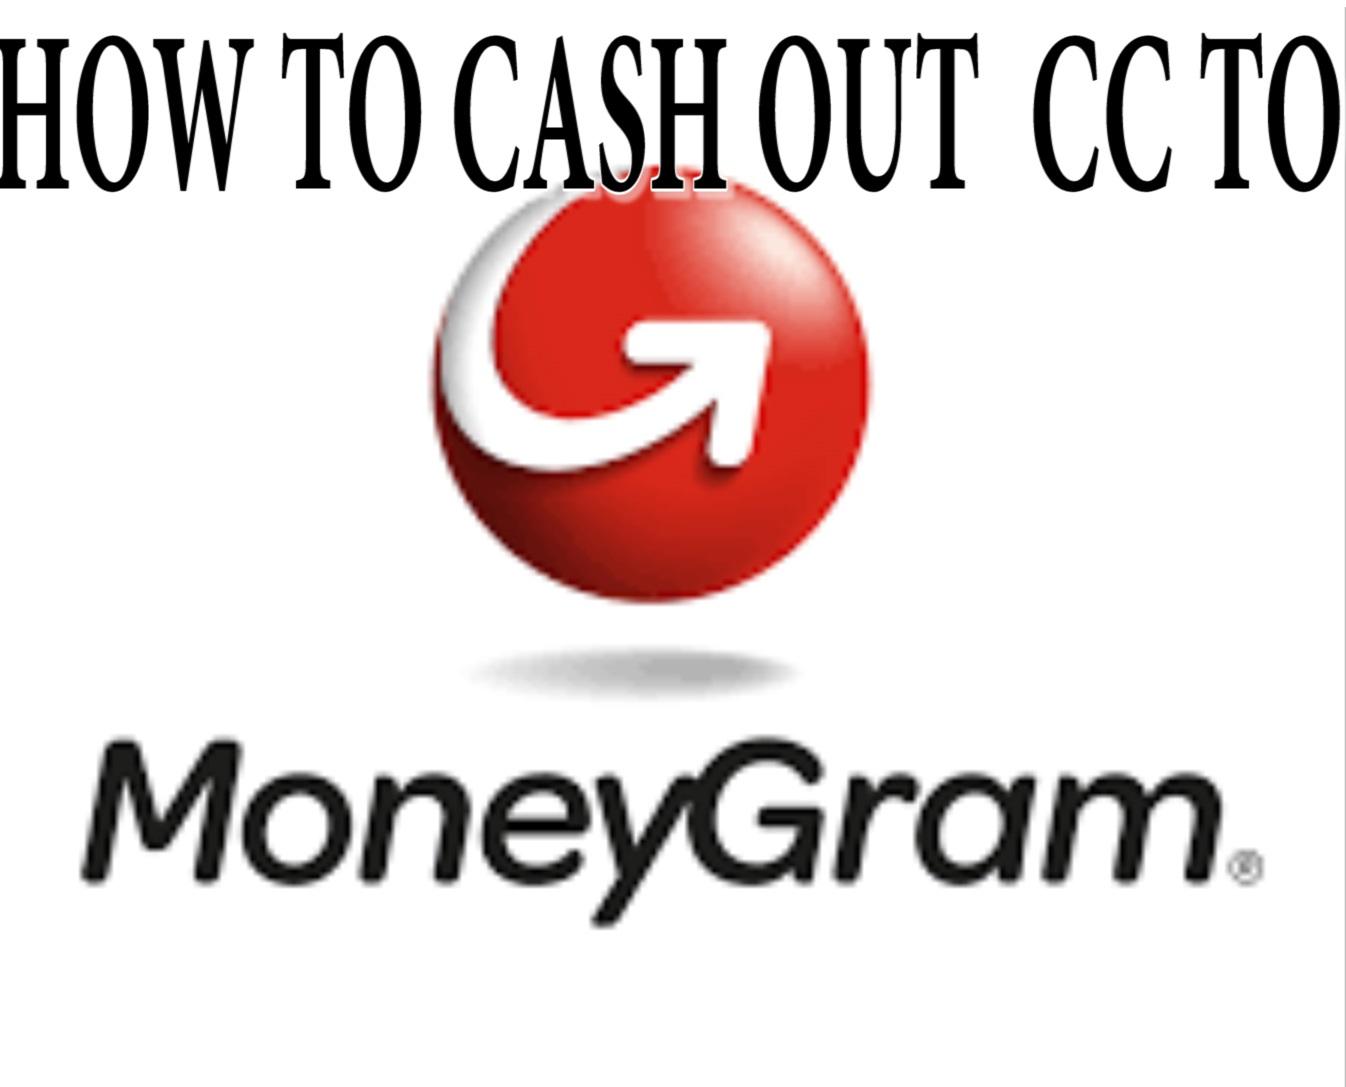 CC TO MONEYGRAM METHOD 2018 - KpoyagaHack | Best Blog To Learn All